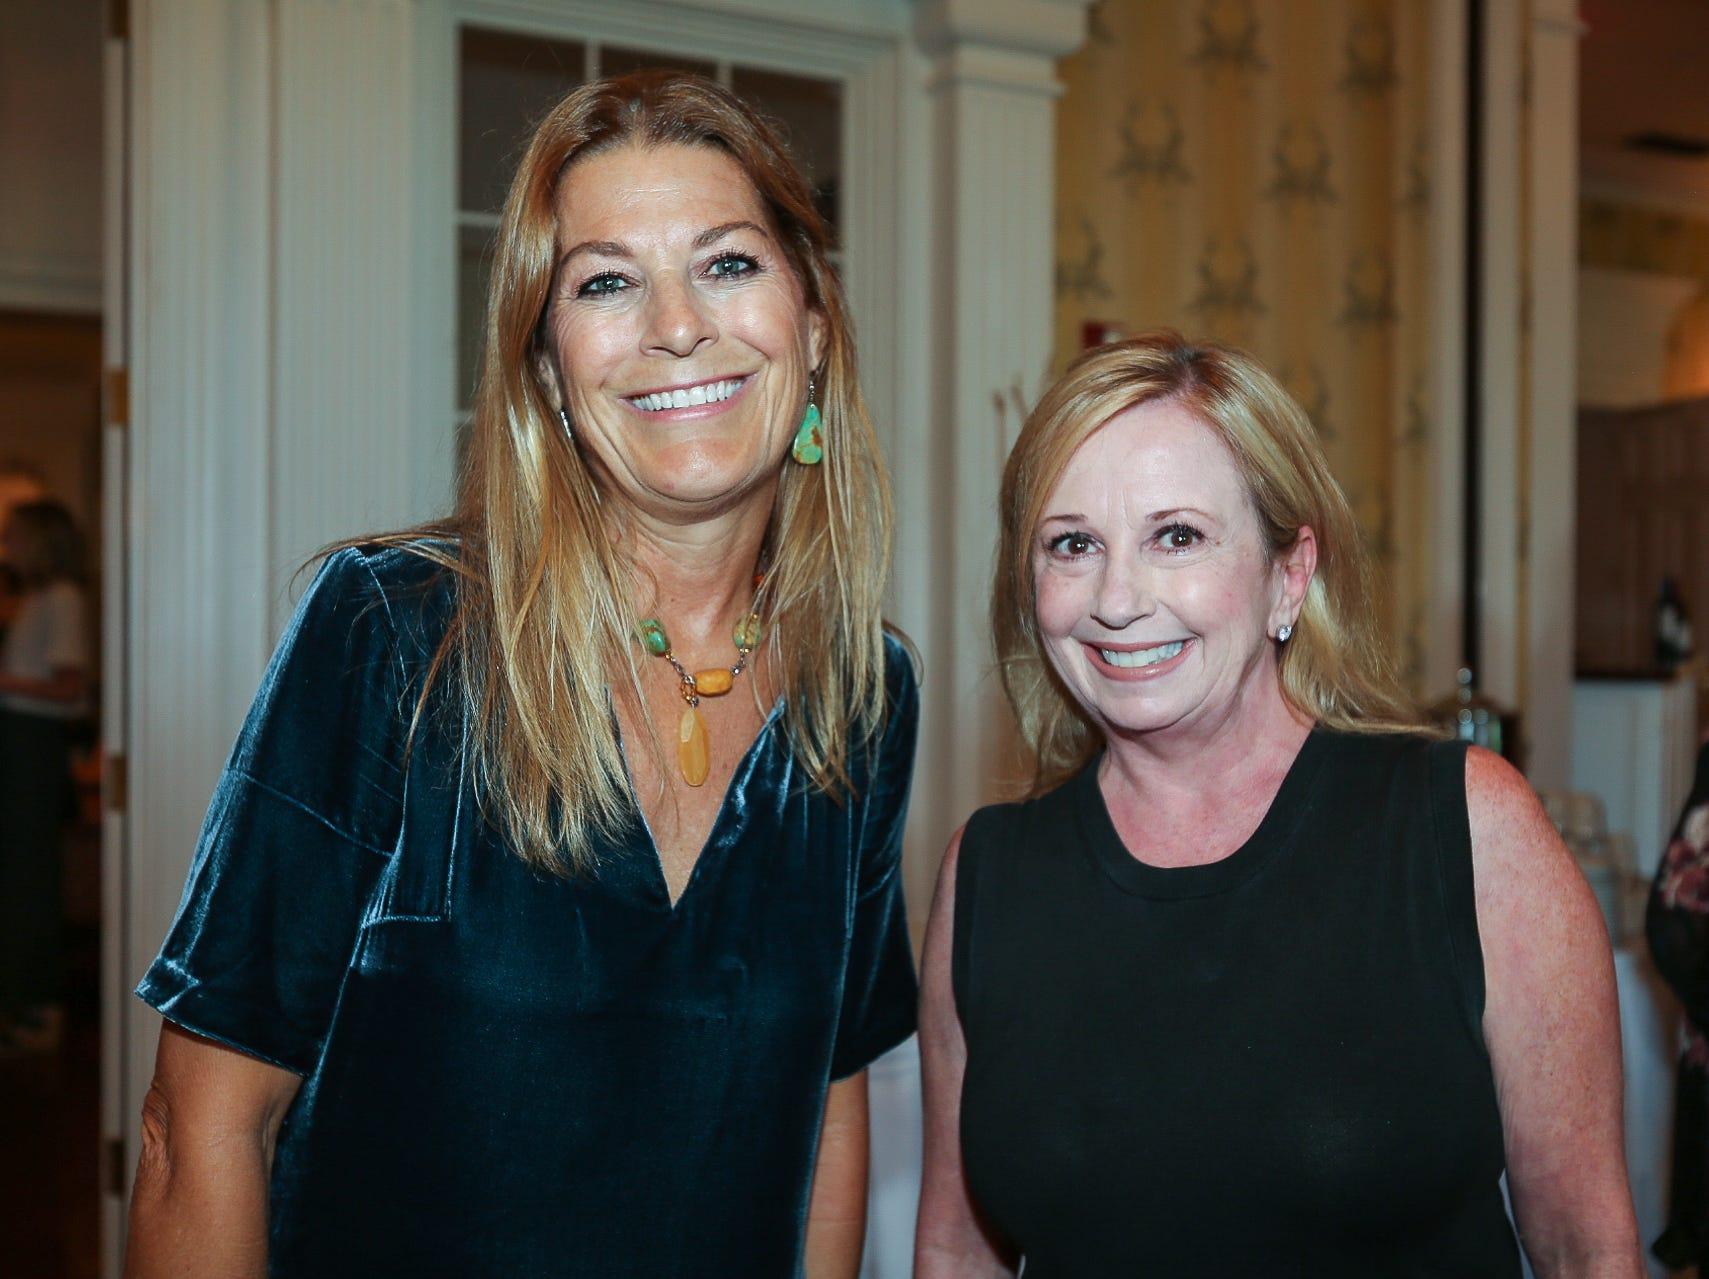 Silvia Sheppard and Tery O'Shell